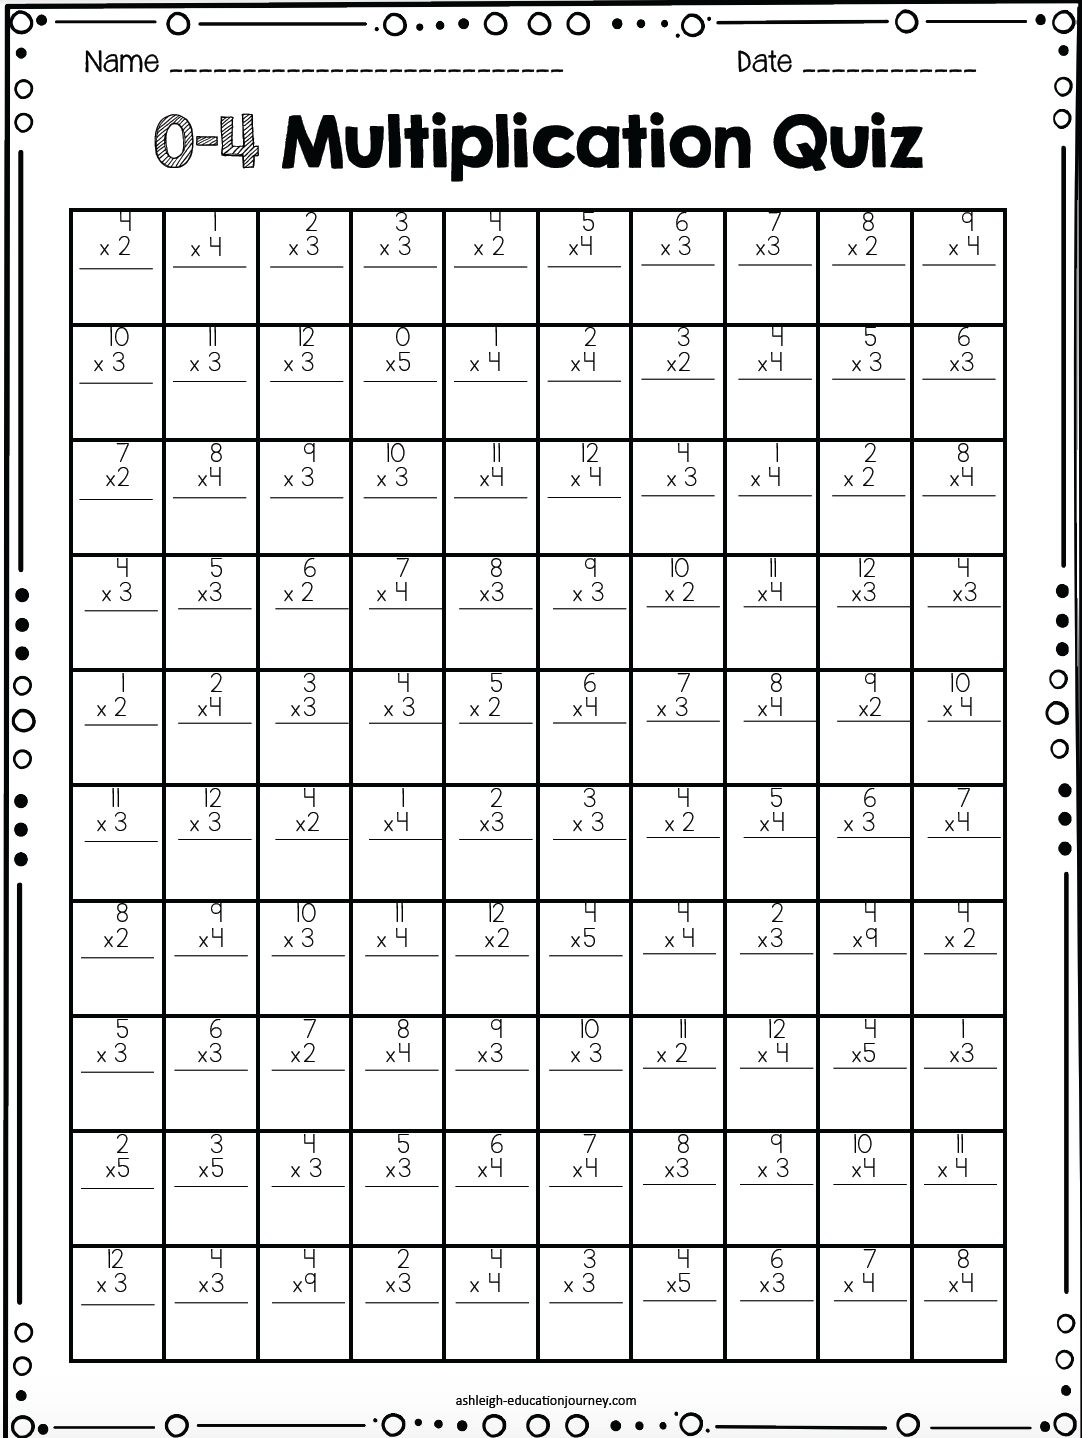 Progressive Multiplication Worksheets For Incrementally